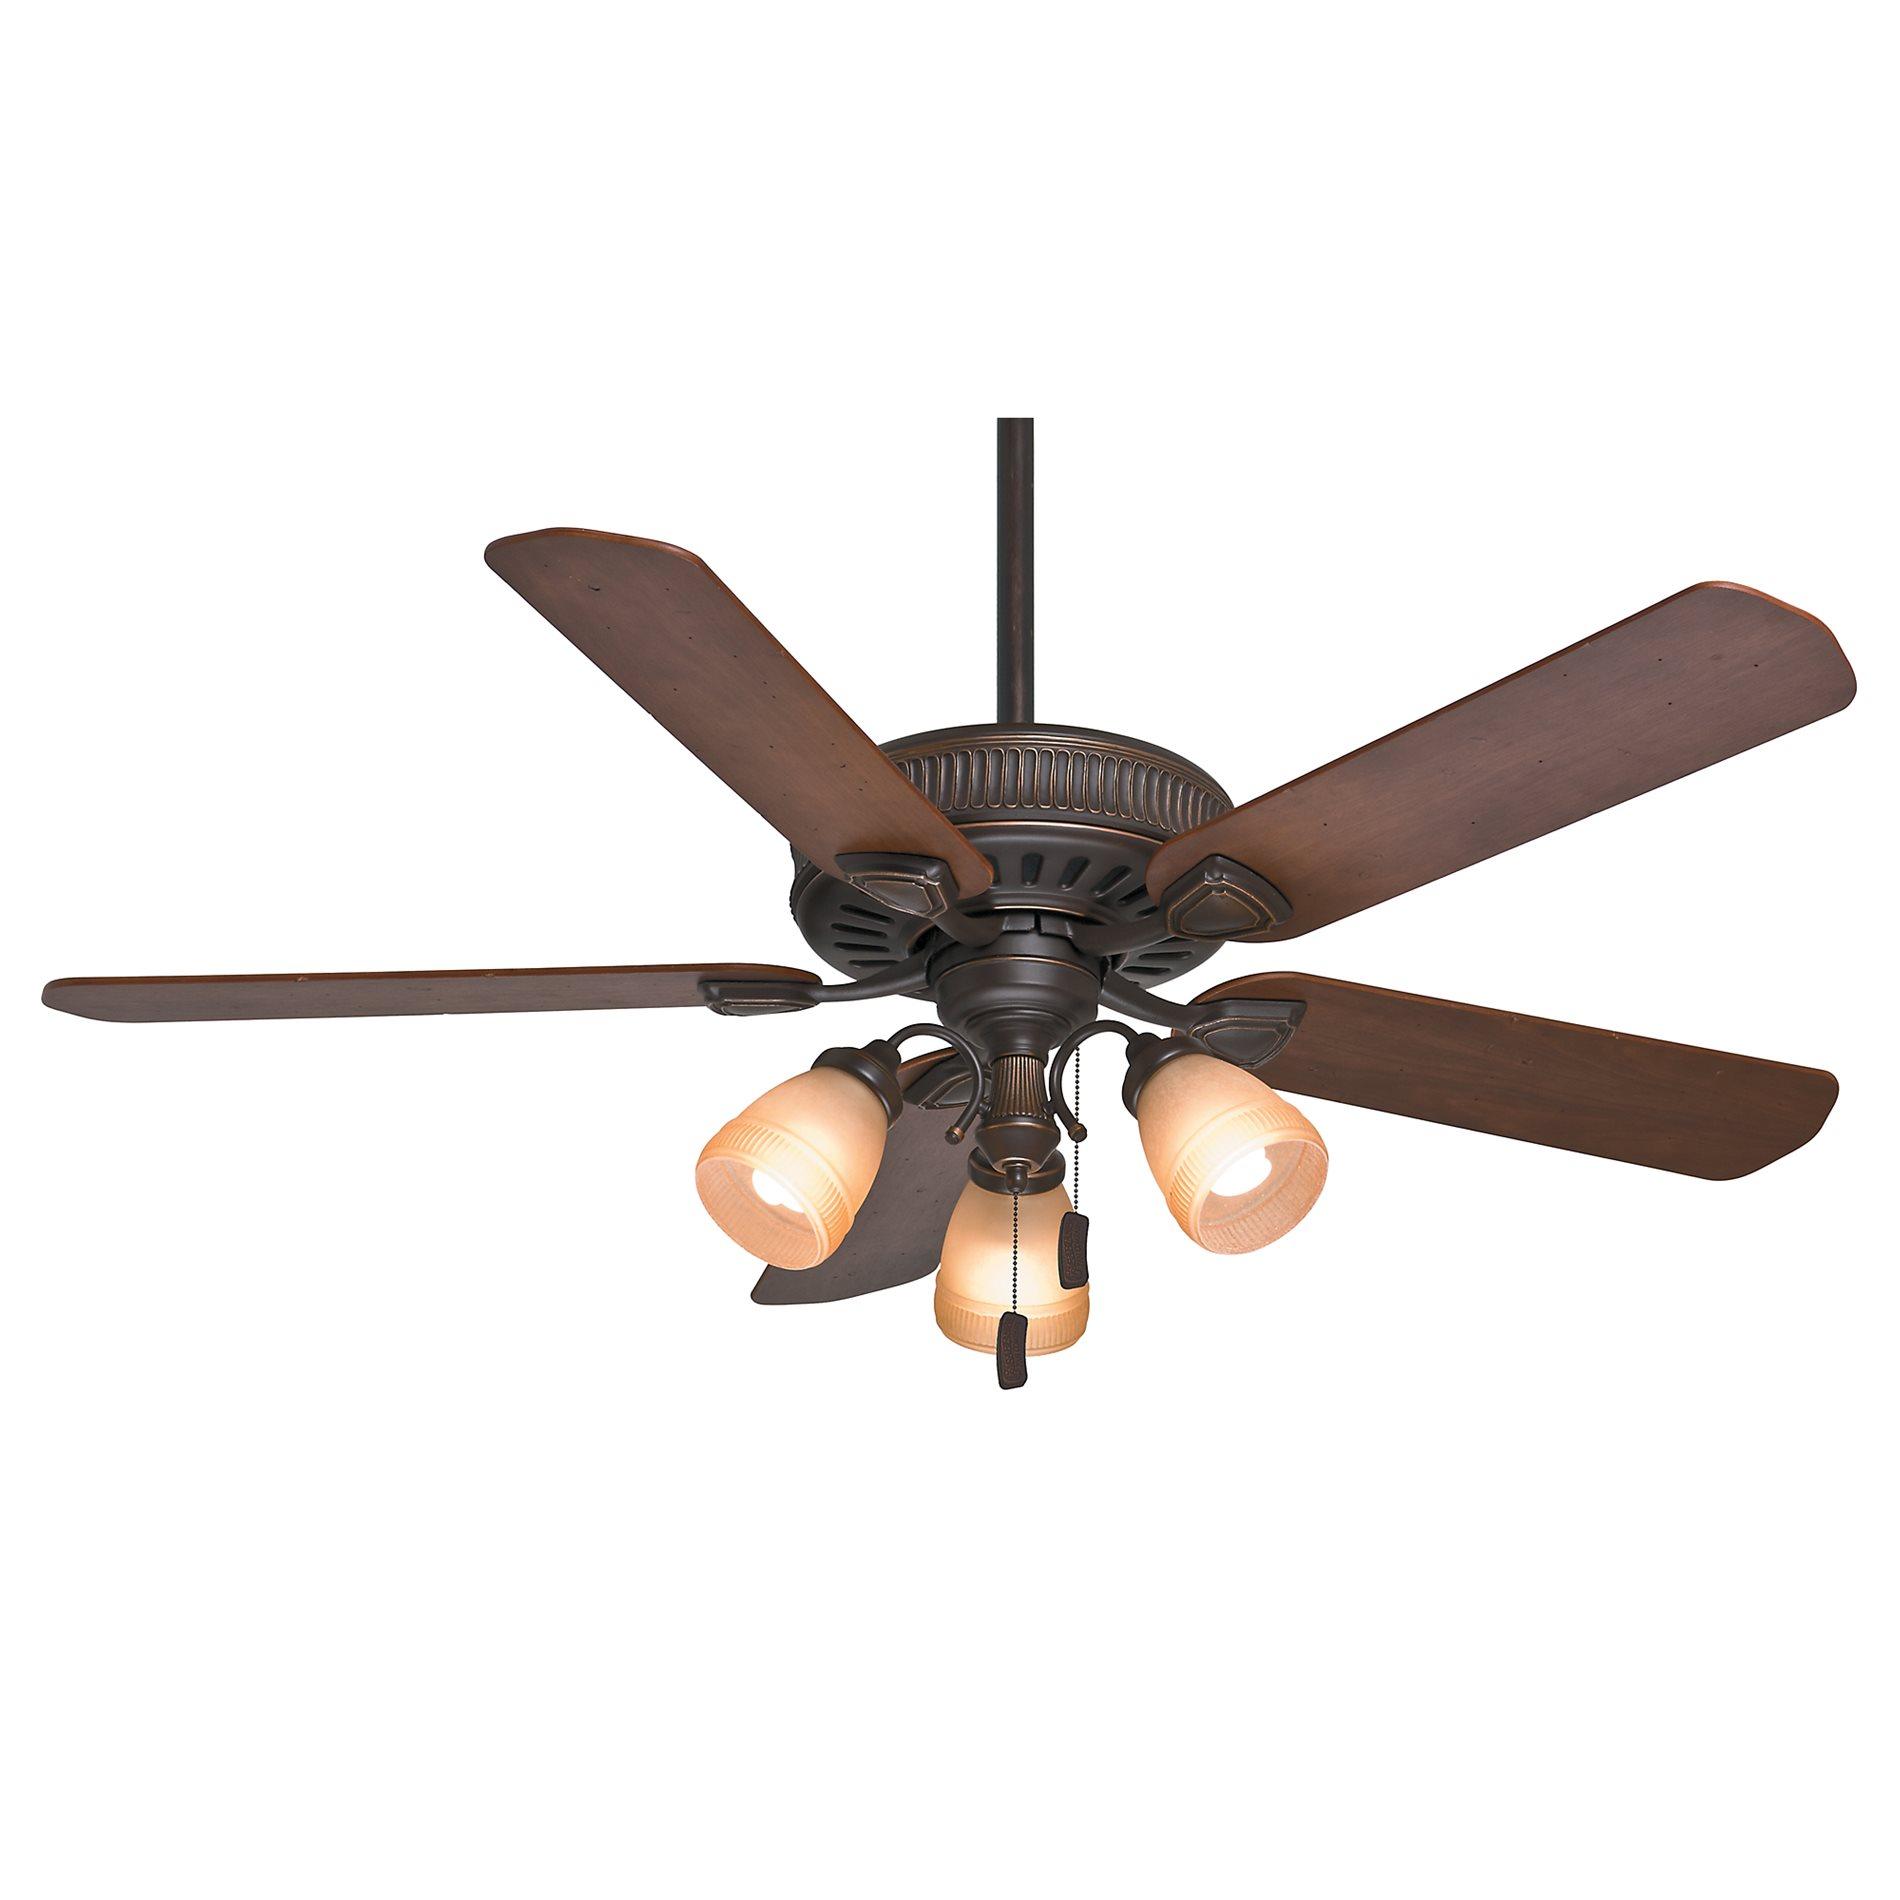 casablanca fans ainsworth gallery 54 transitional ceiling fan casa. Black Bedroom Furniture Sets. Home Design Ideas